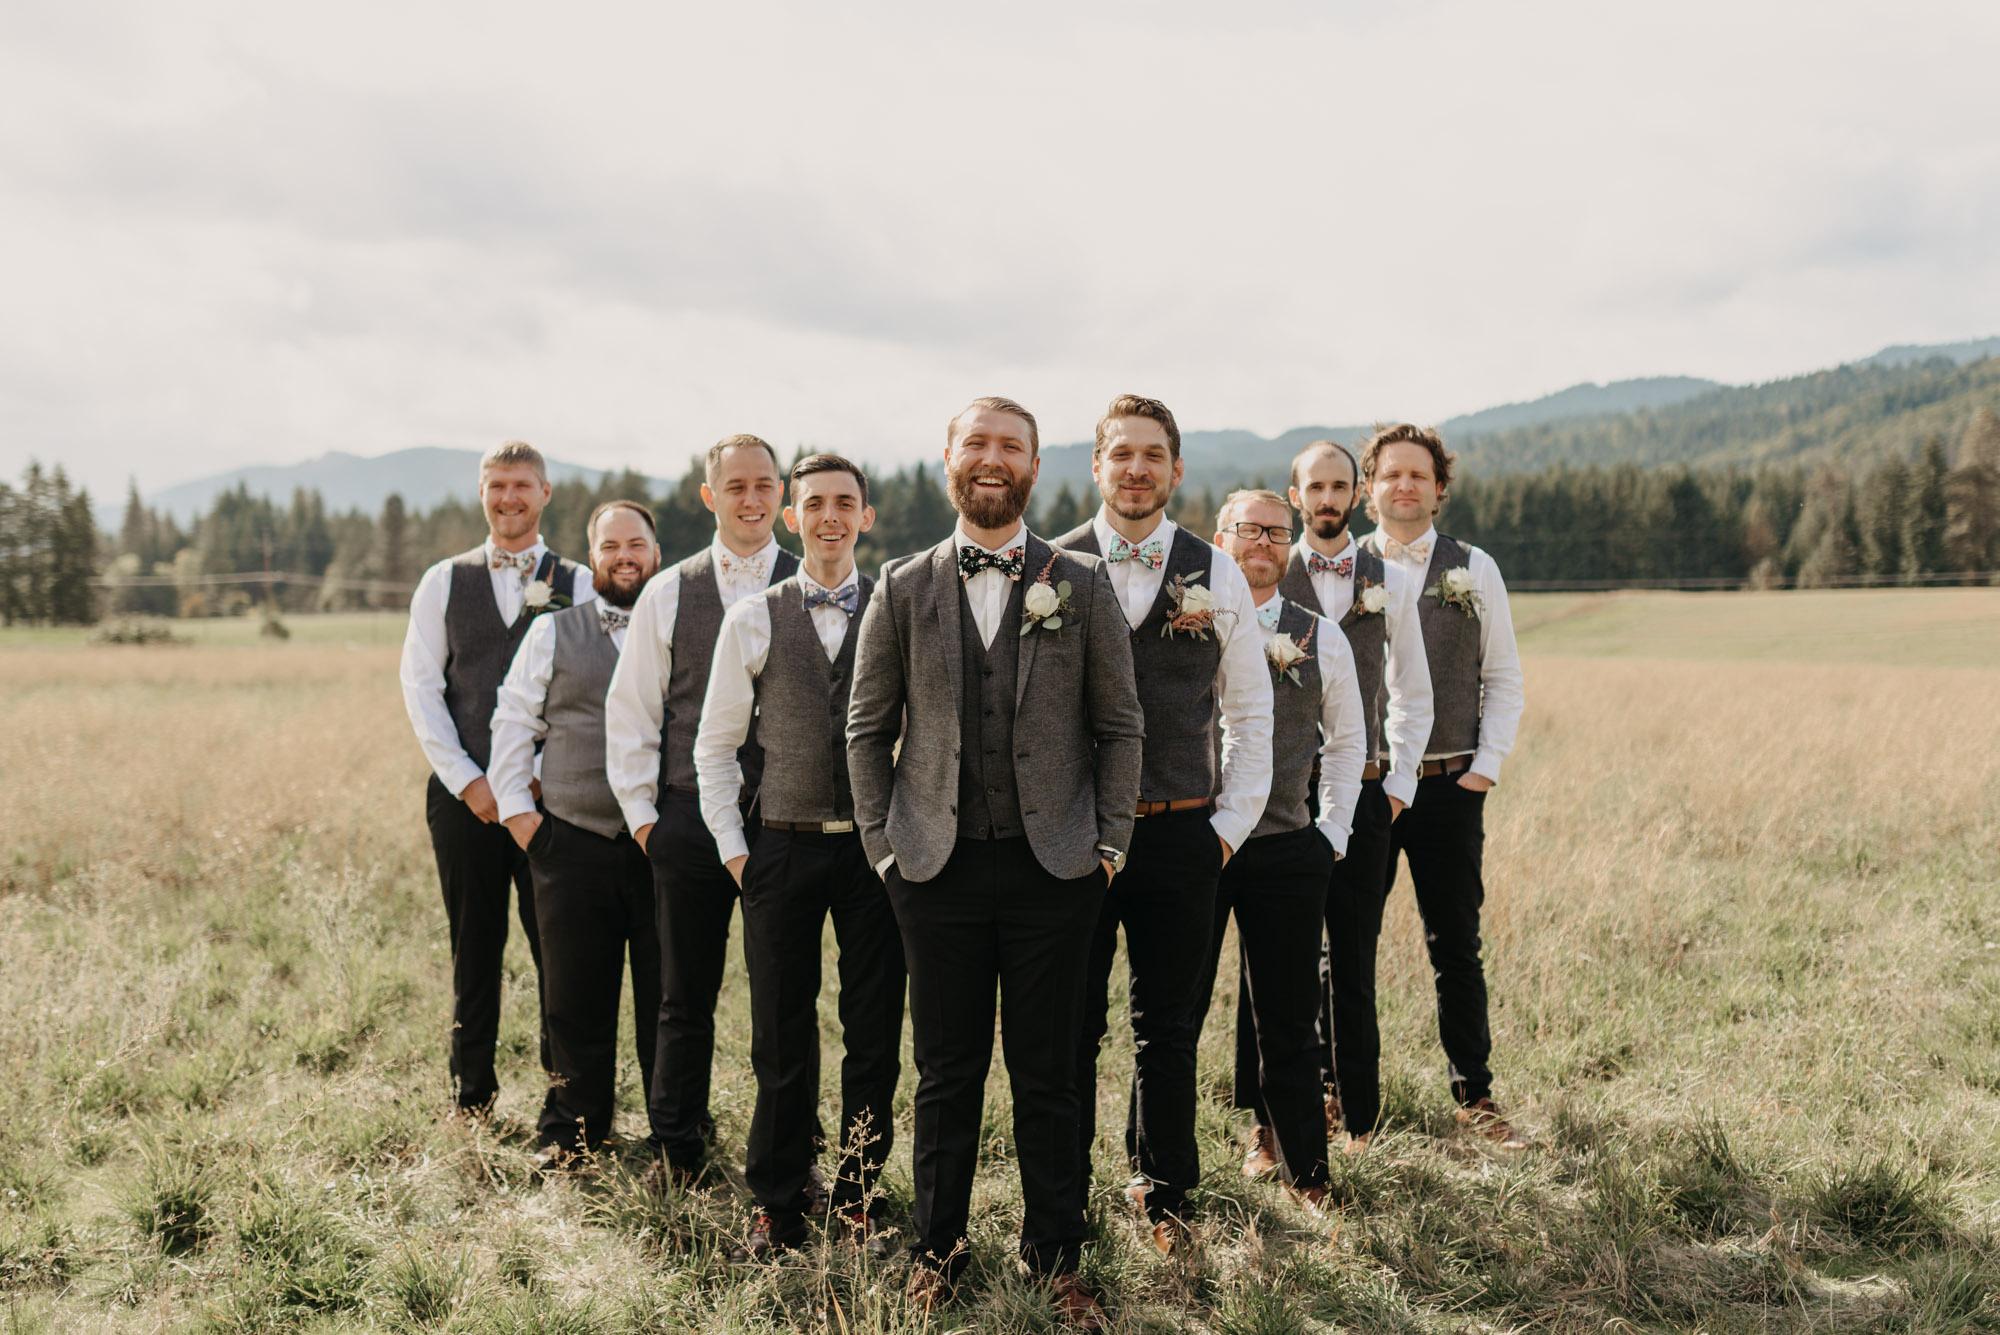 Bridal-Party-Free-People-Flower-Dresses-Washington-Wedding-8382.jpg